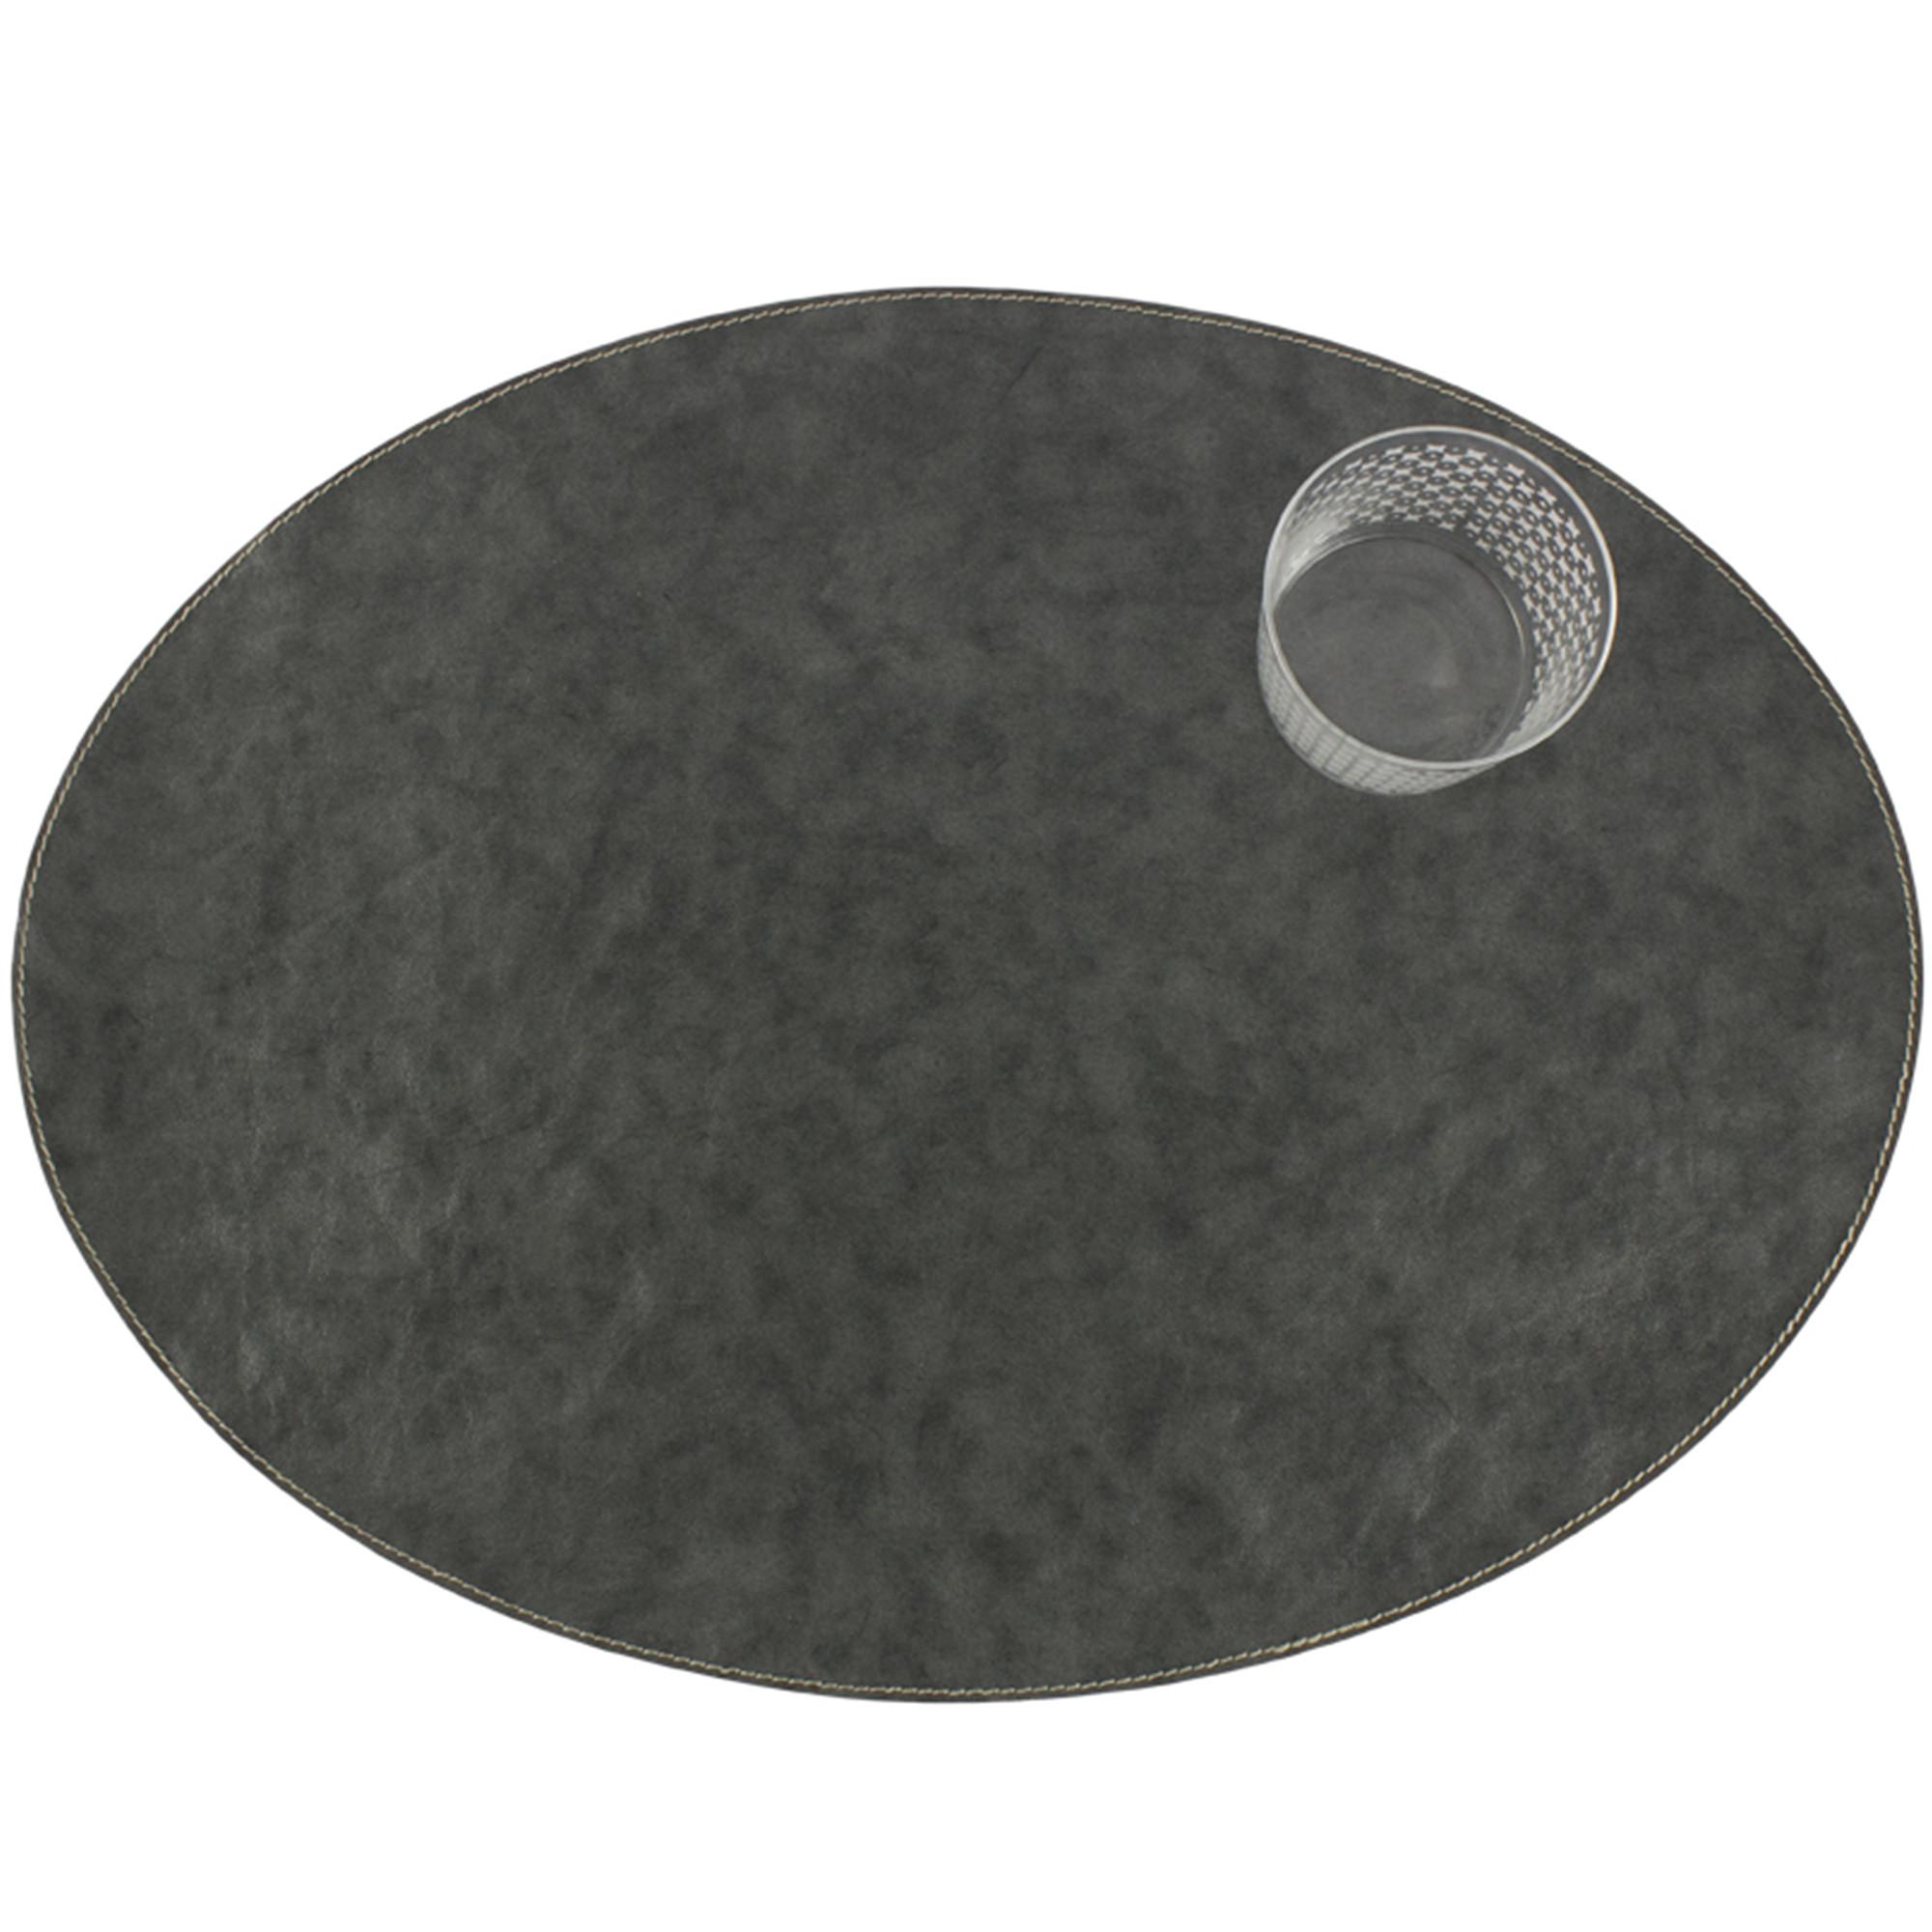 Dækkeserviet, Oval – Mørkegrå